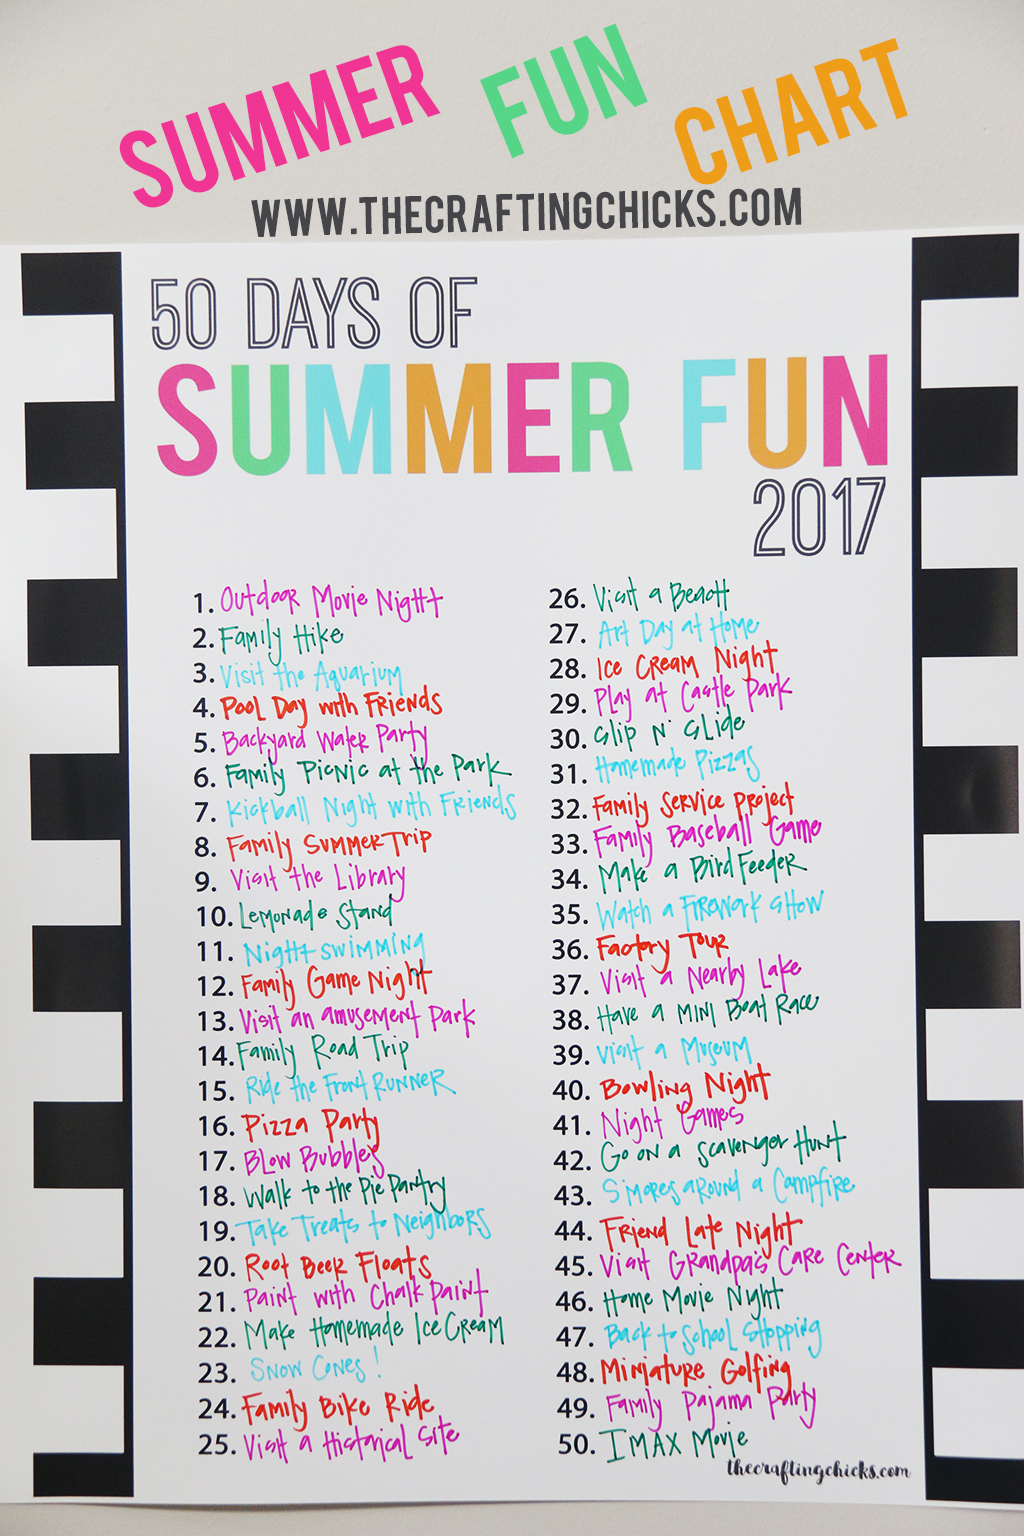 foto de Summer FUN Chart 2017 The Crafting Chicks